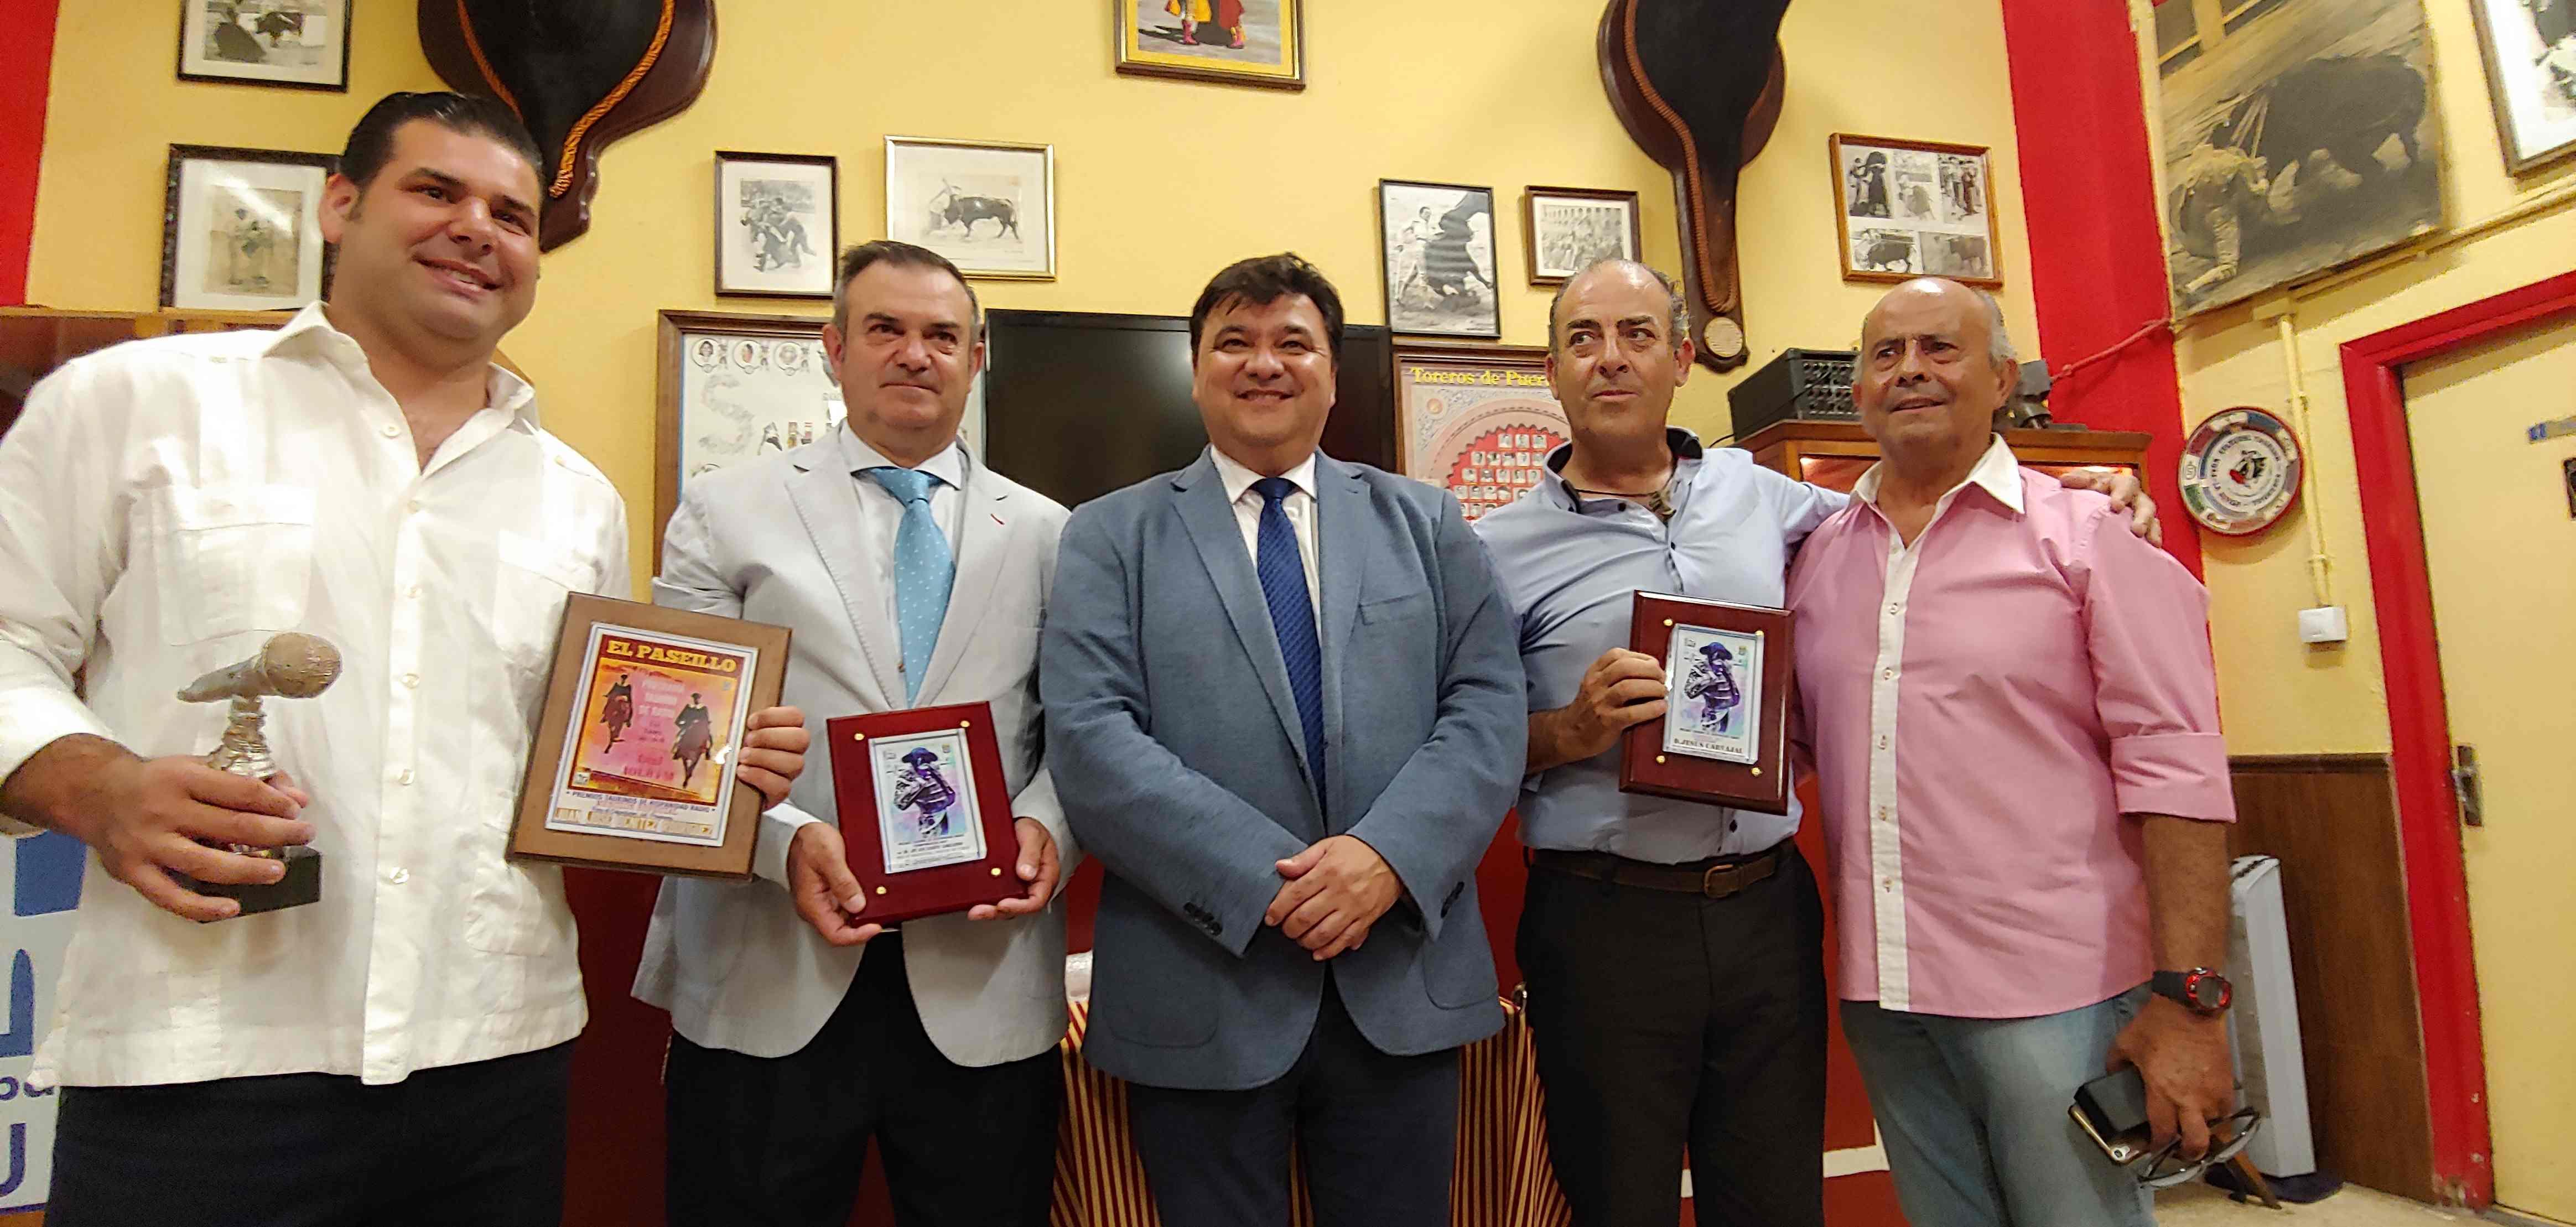 premio taurinos el paseillo 25-07-2018